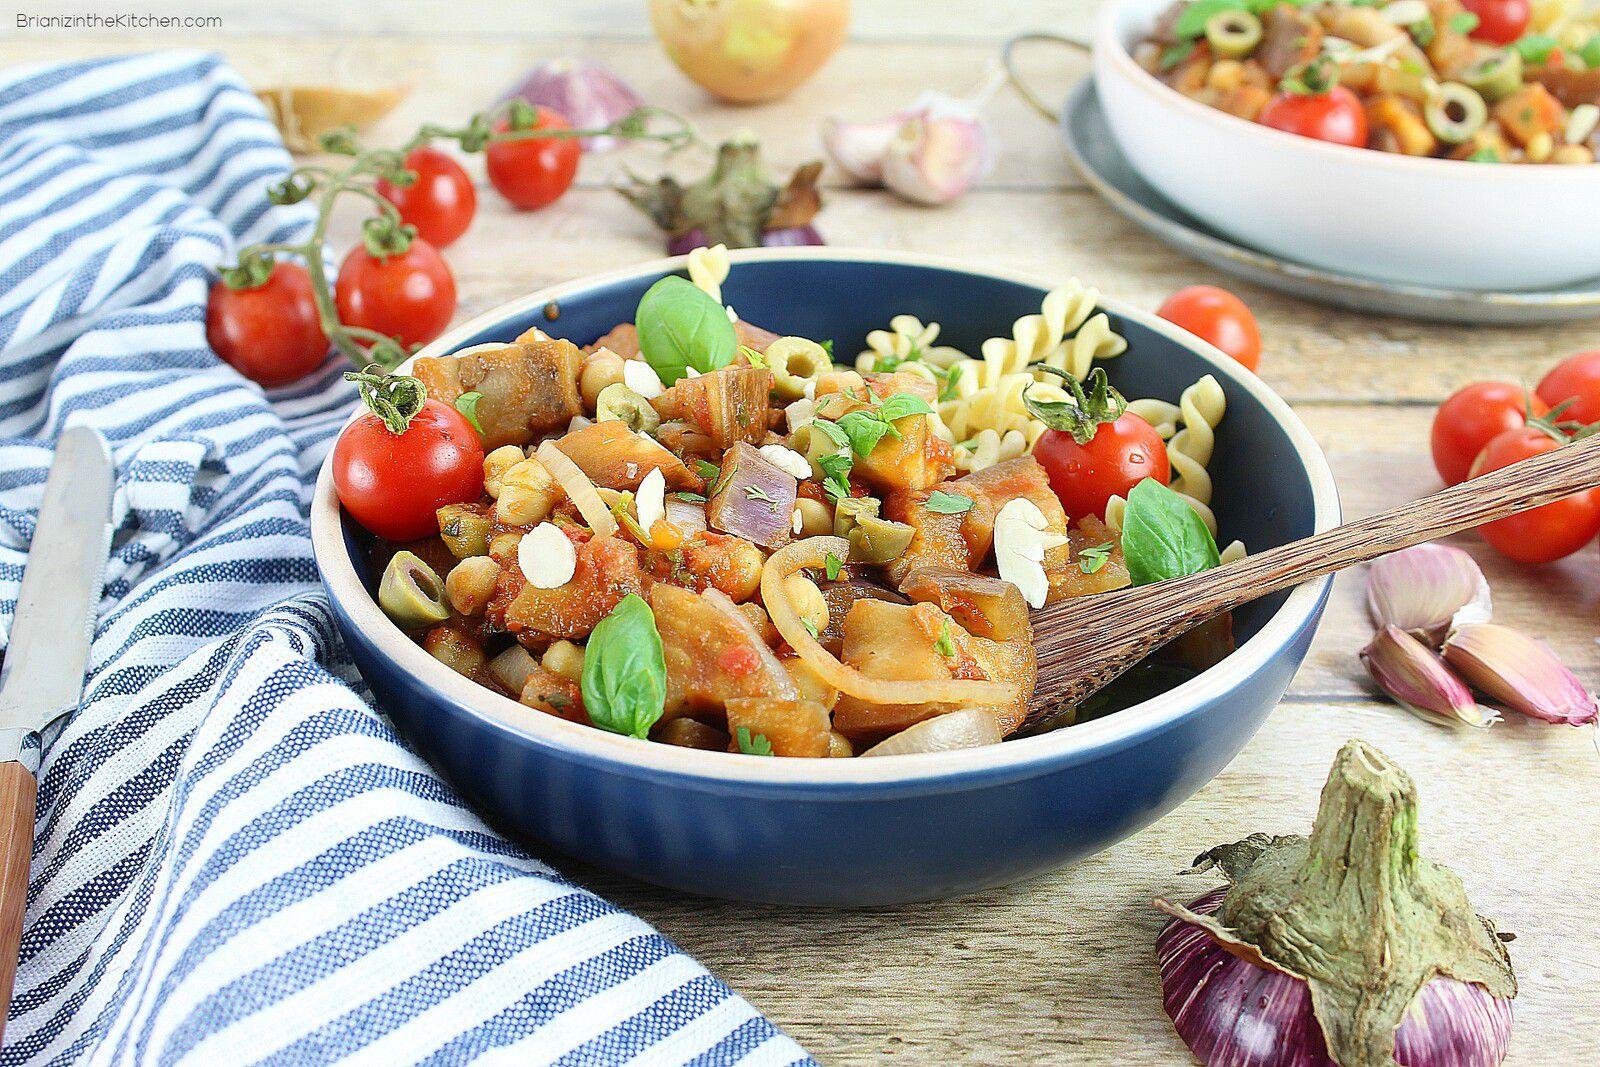 Ragoût Végétarien aux Aubergines